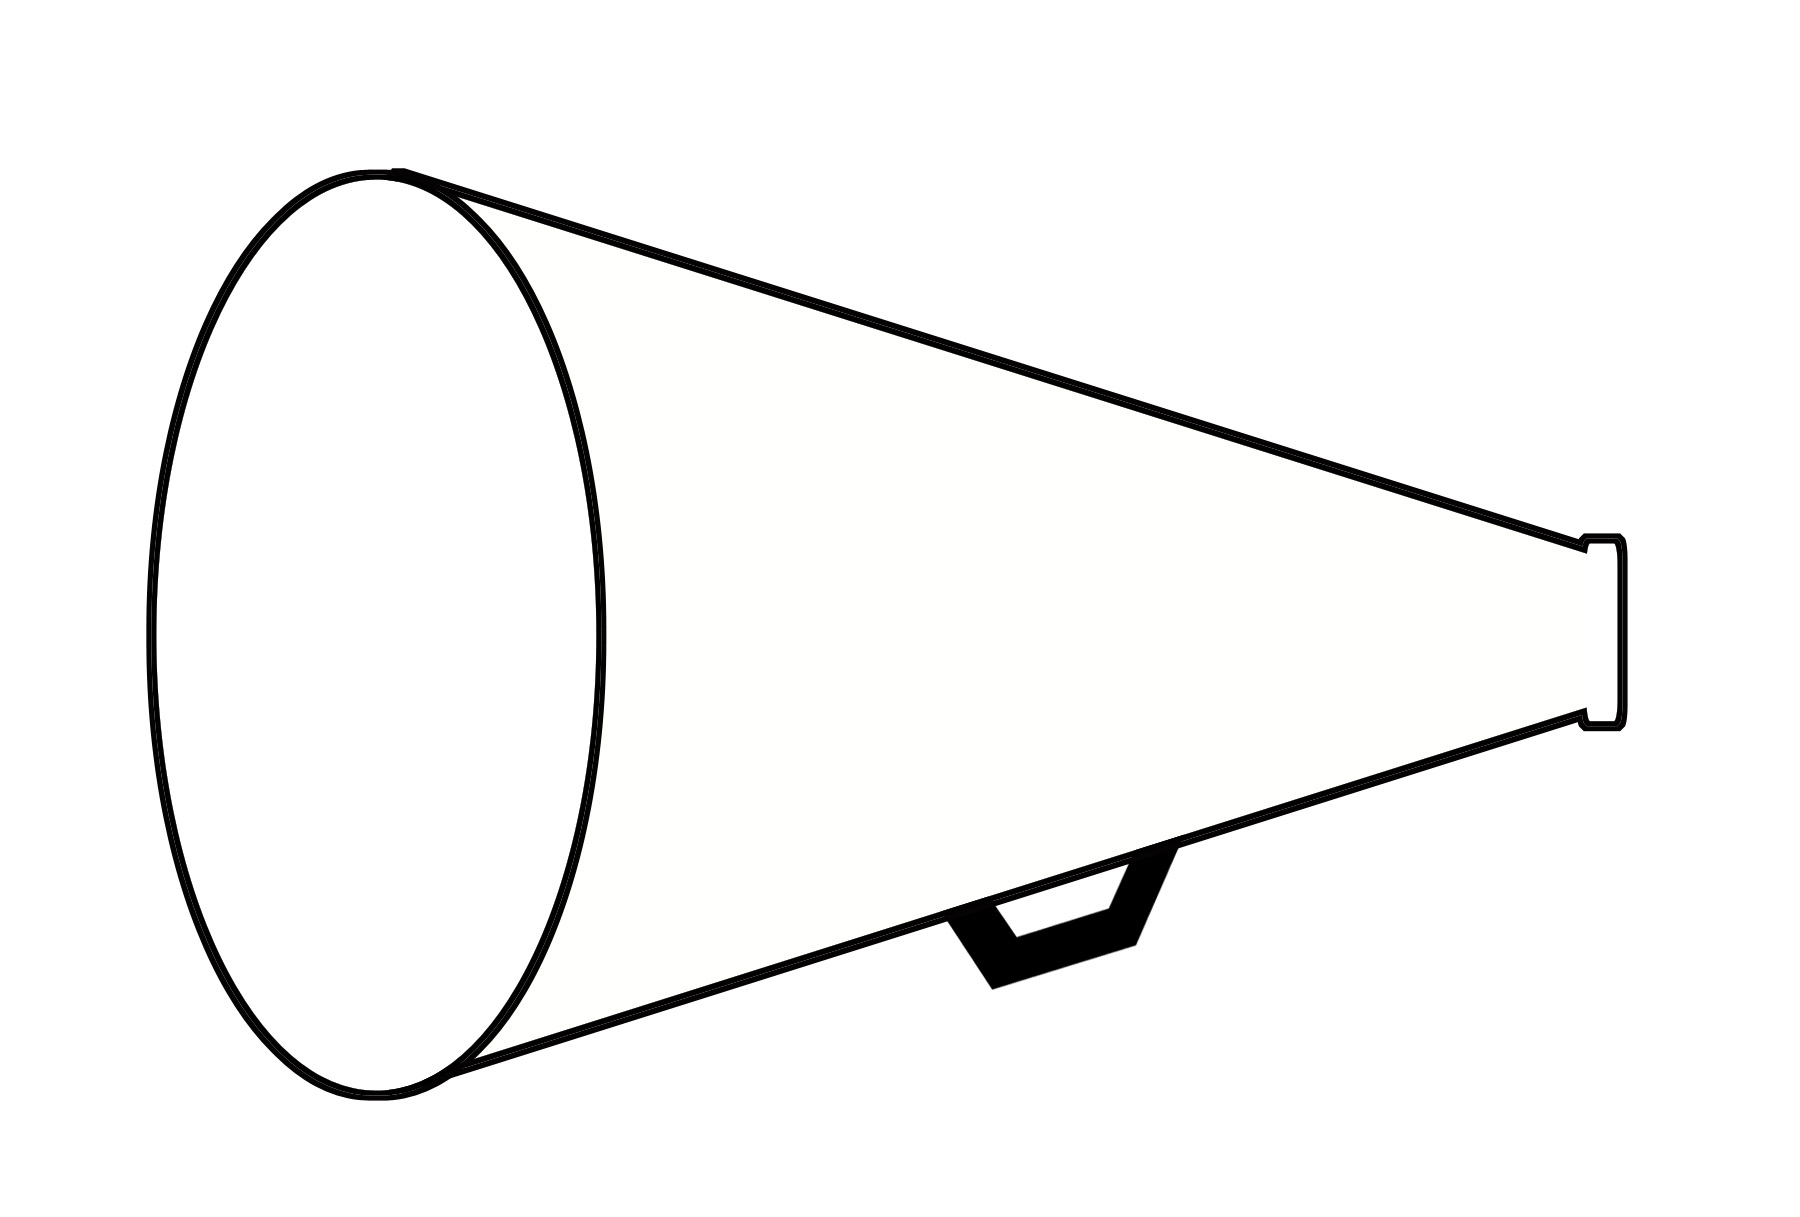 Clip Art Megaphone Clip Art megaphone clipart 9 gclipart com cheerleading tumundografico 2